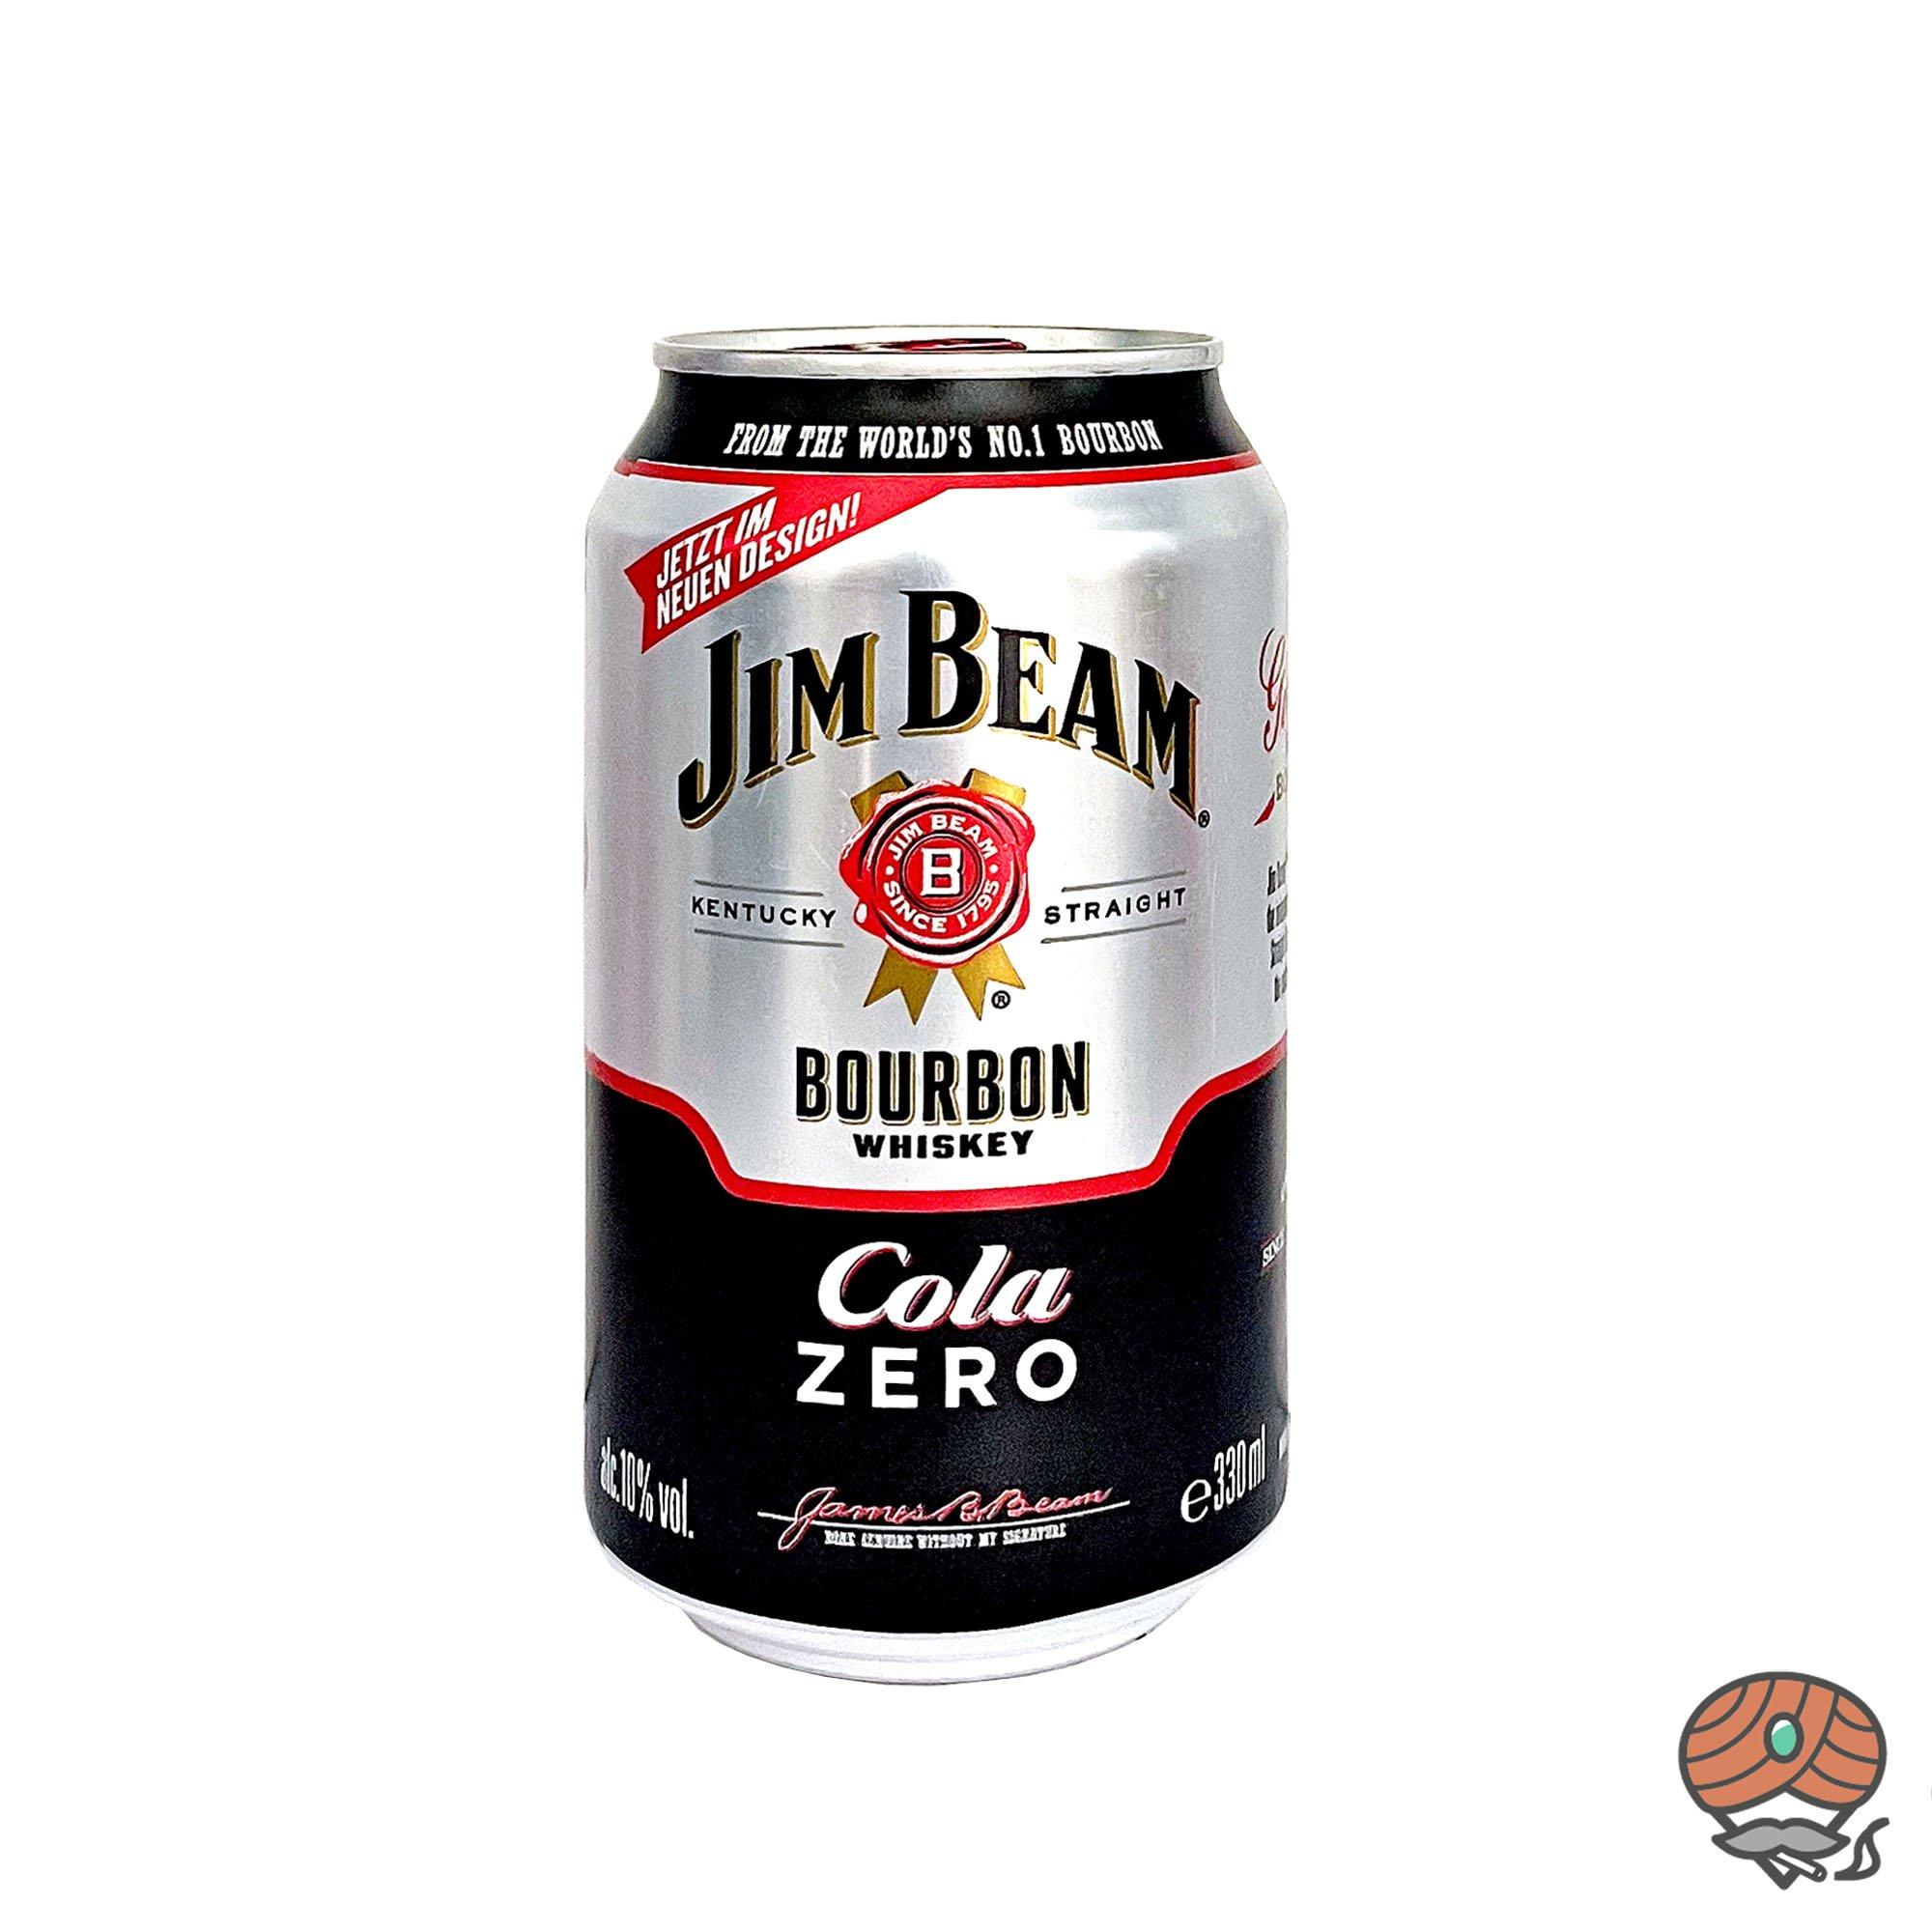 Jim Beam Bourbon Whiskey + Cola Zero 0,33 l inkl.0,25 Euro Pfand (alc. 10% Vol)